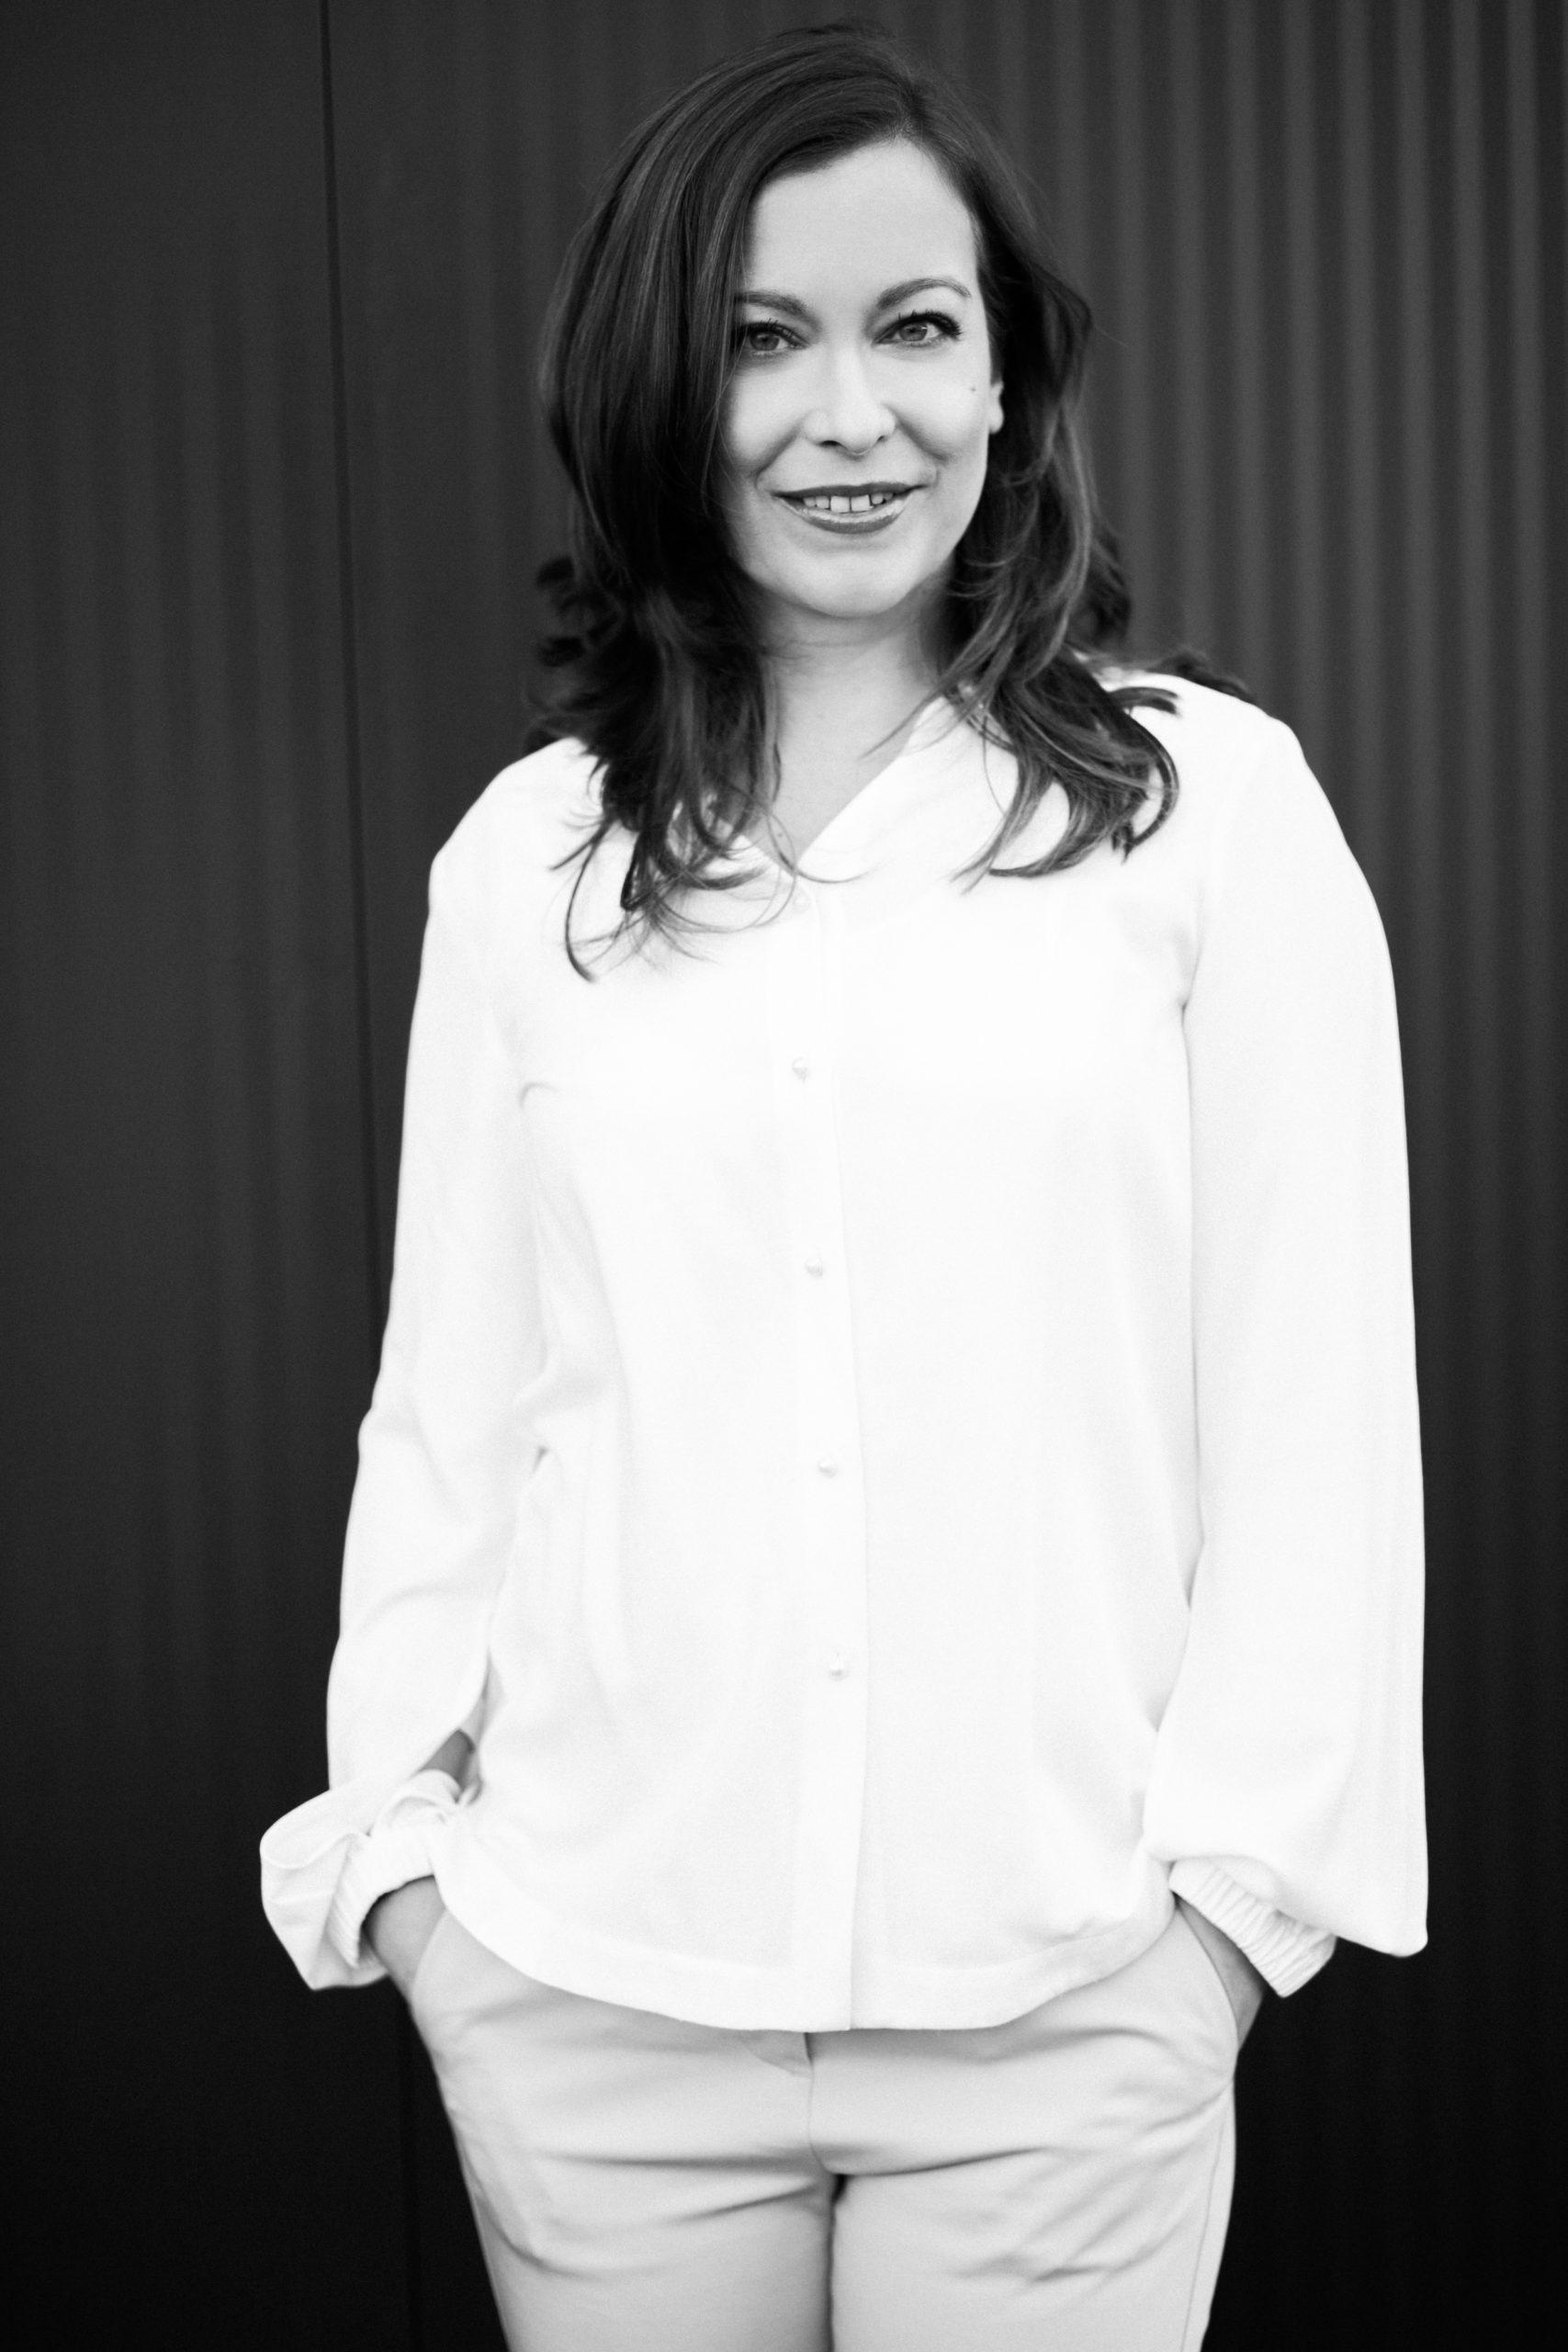 Portrait: Pia Niederwimmer Raunjak